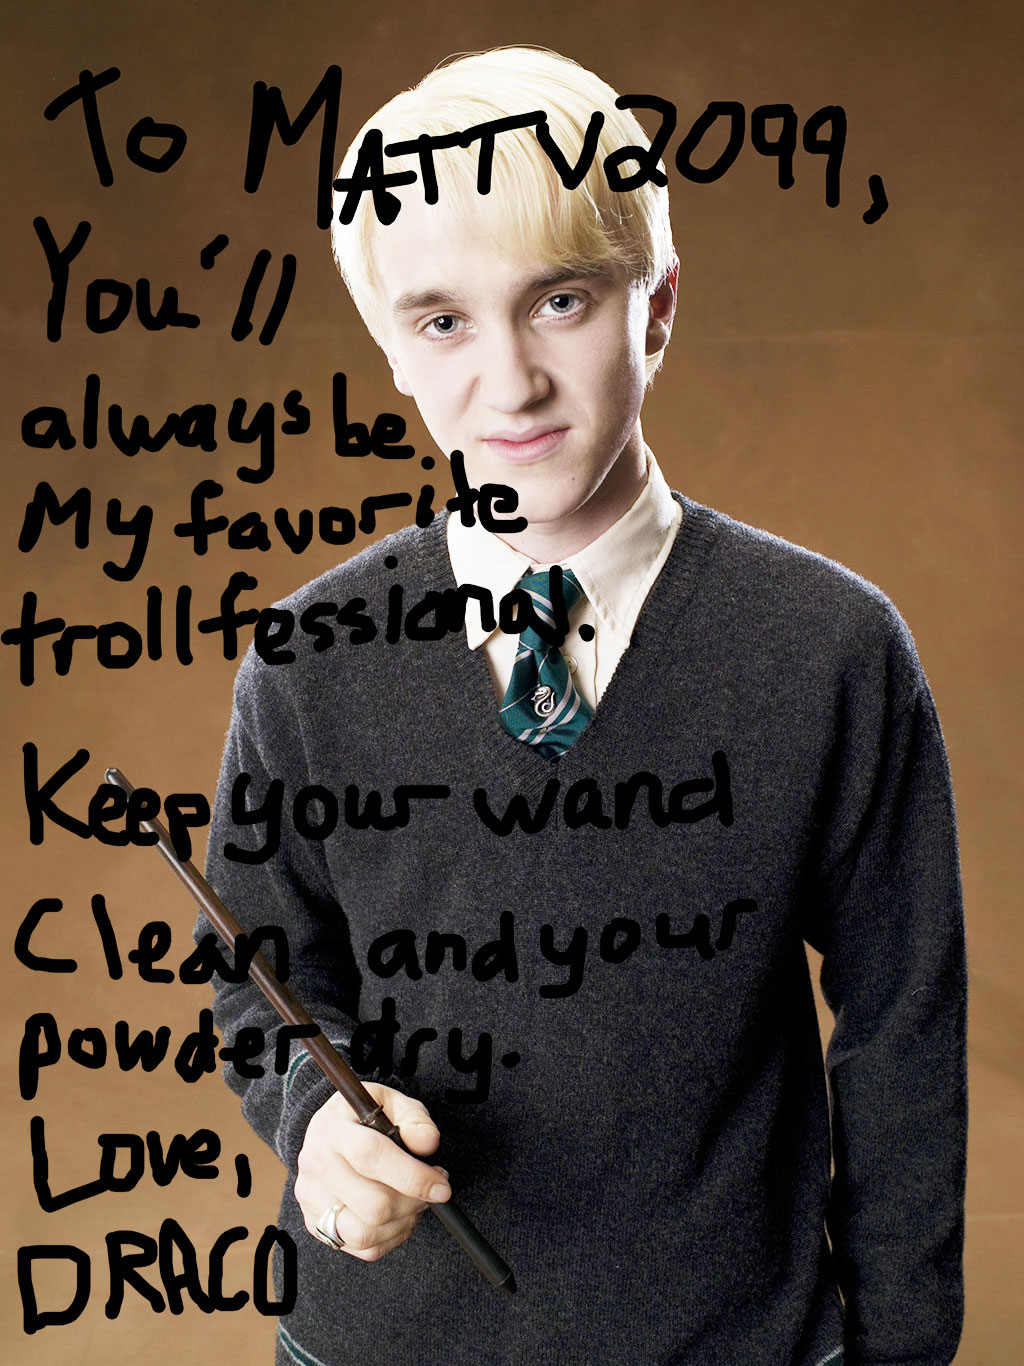 Draco-Malfoy-Mattv2099